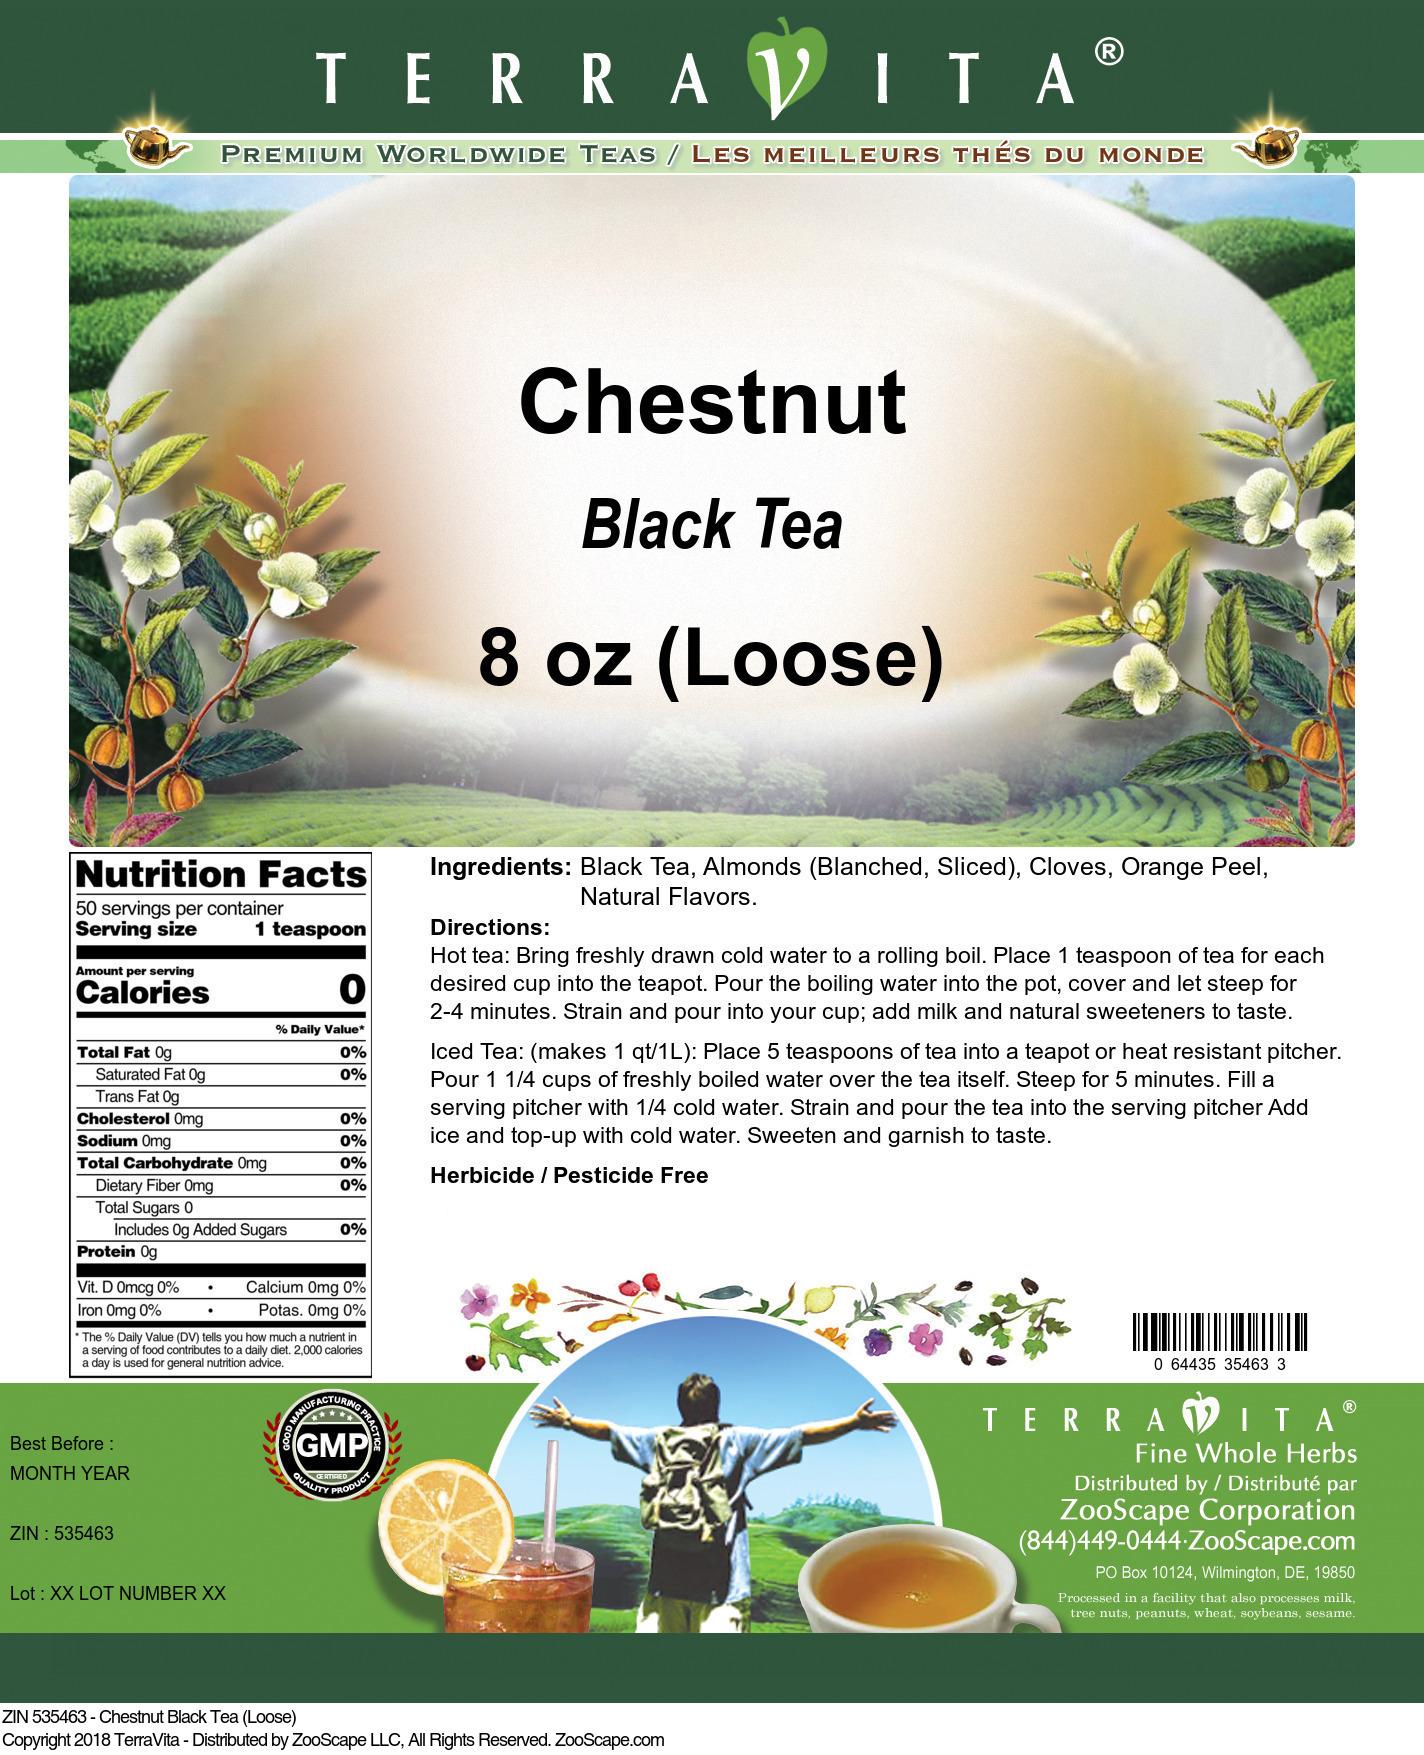 Chestnut Black Tea